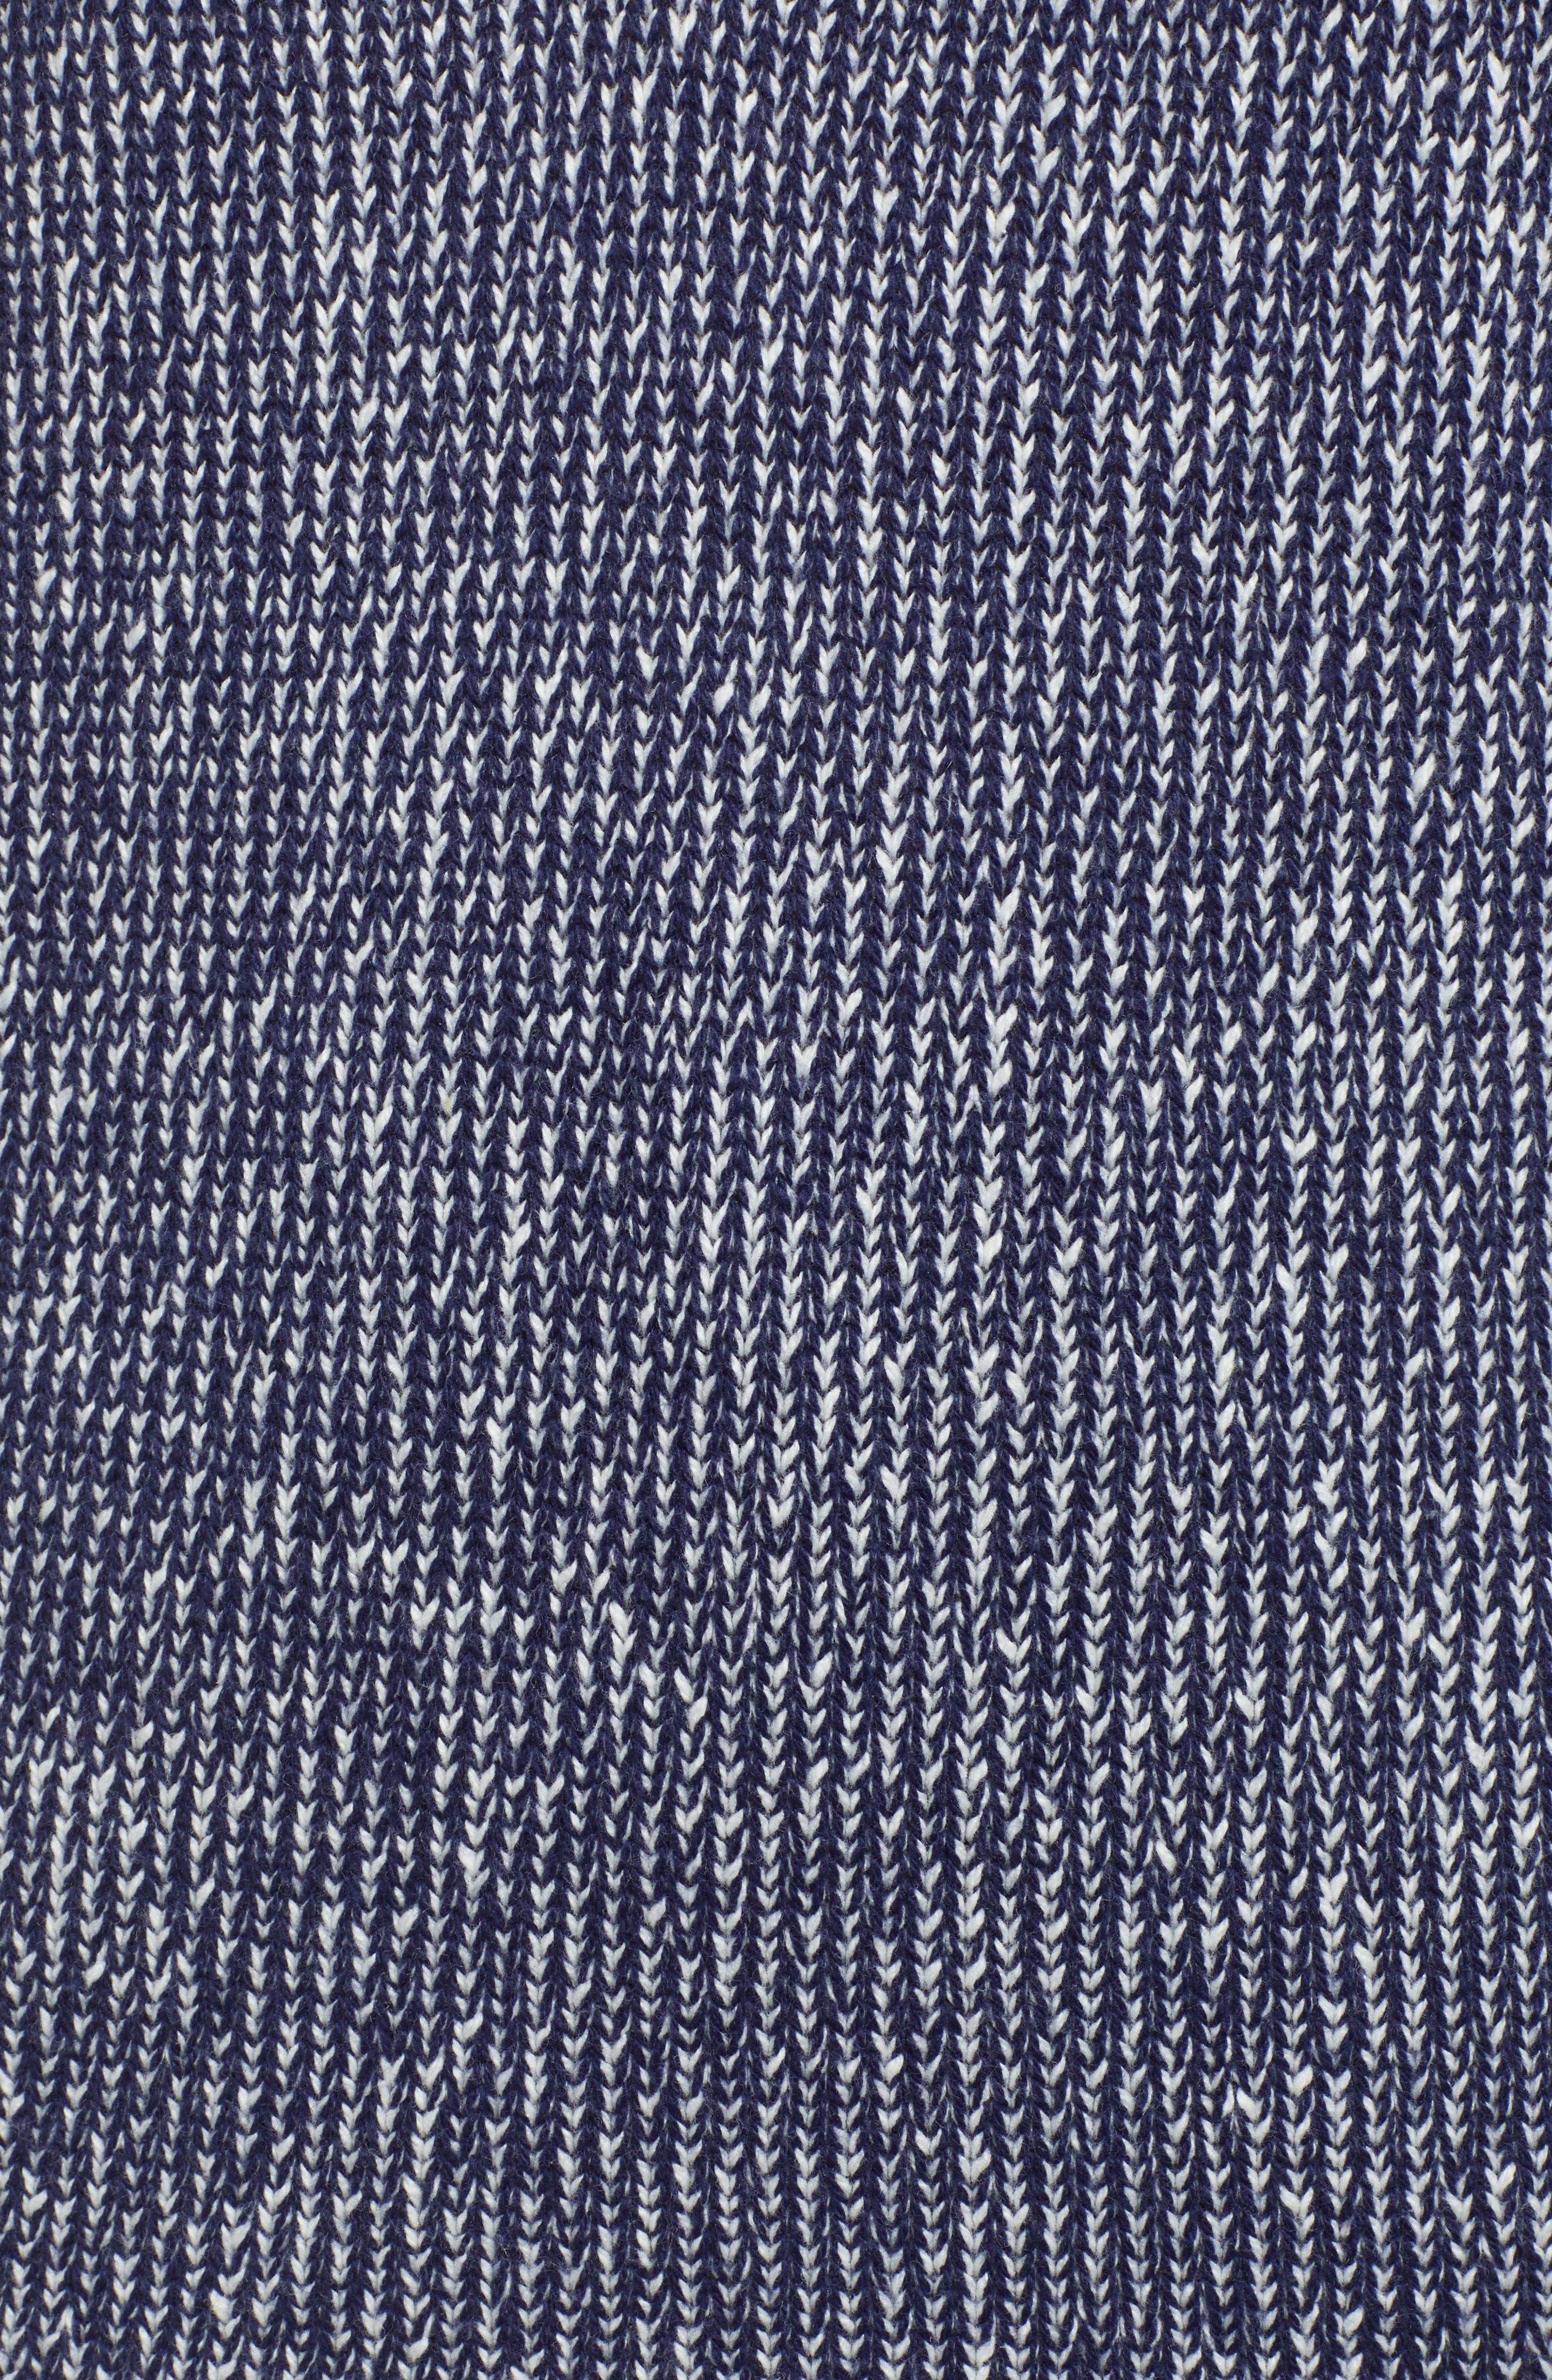 Marled V-Neck Sweater,                             Alternate thumbnail 5, color,                             NAVY MARITIME- WHITE COMBO